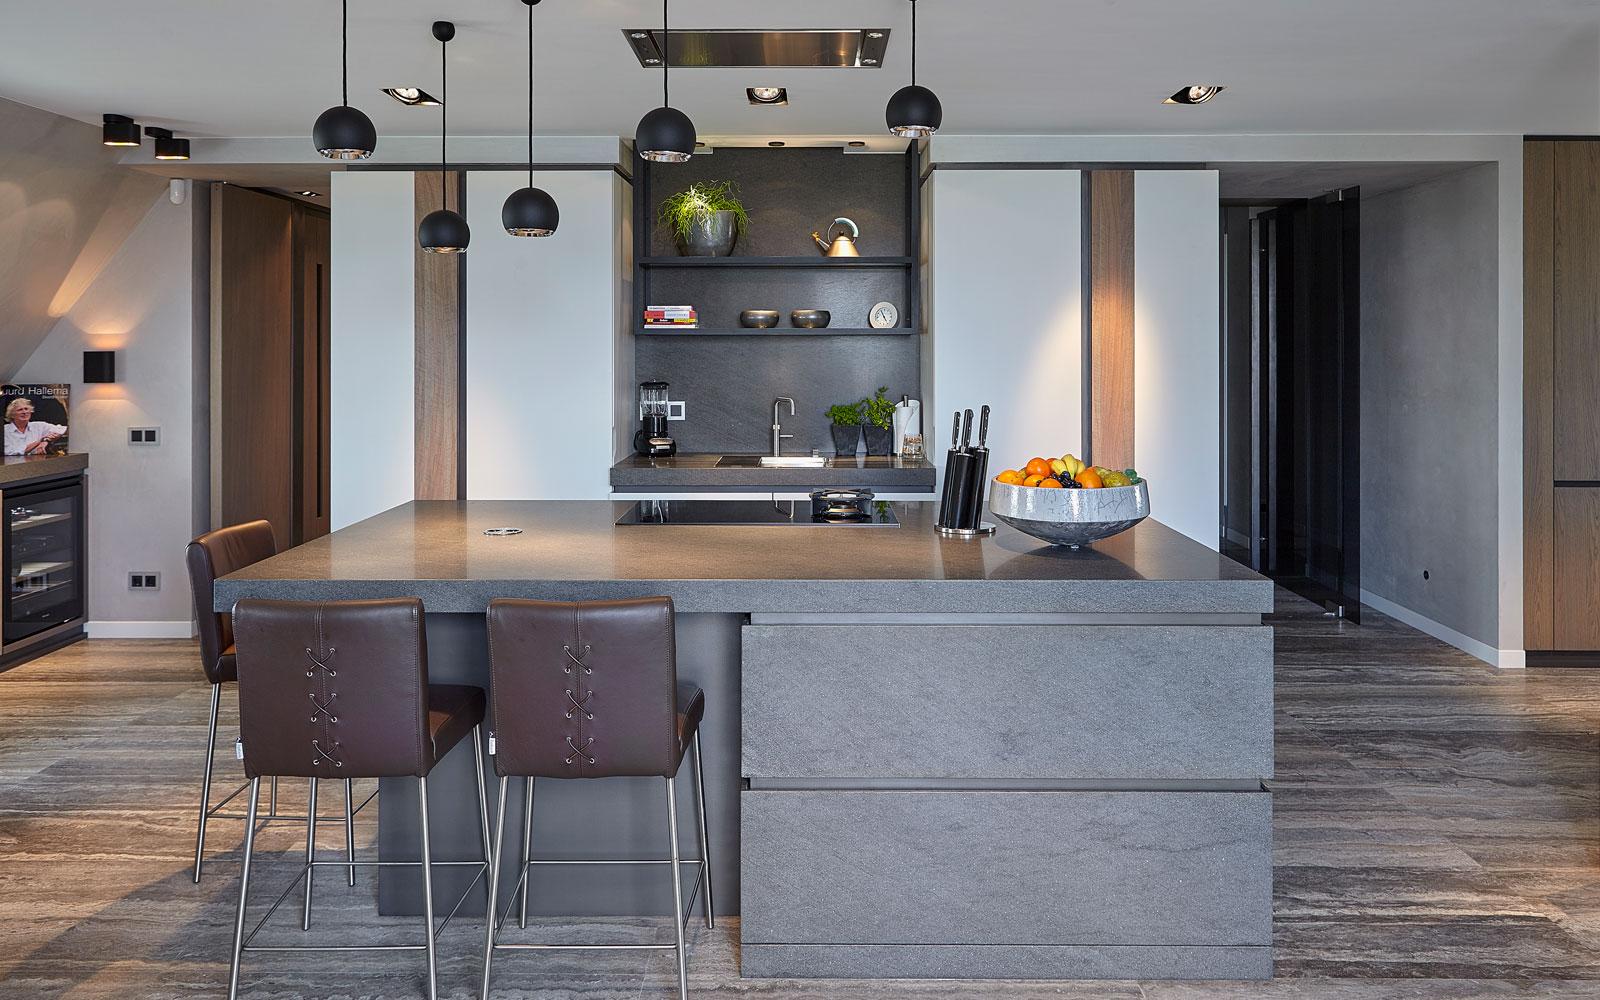 Keuken, kookeiland, bar, kastenwand, weggewerkt, penthouse, Eric Kant